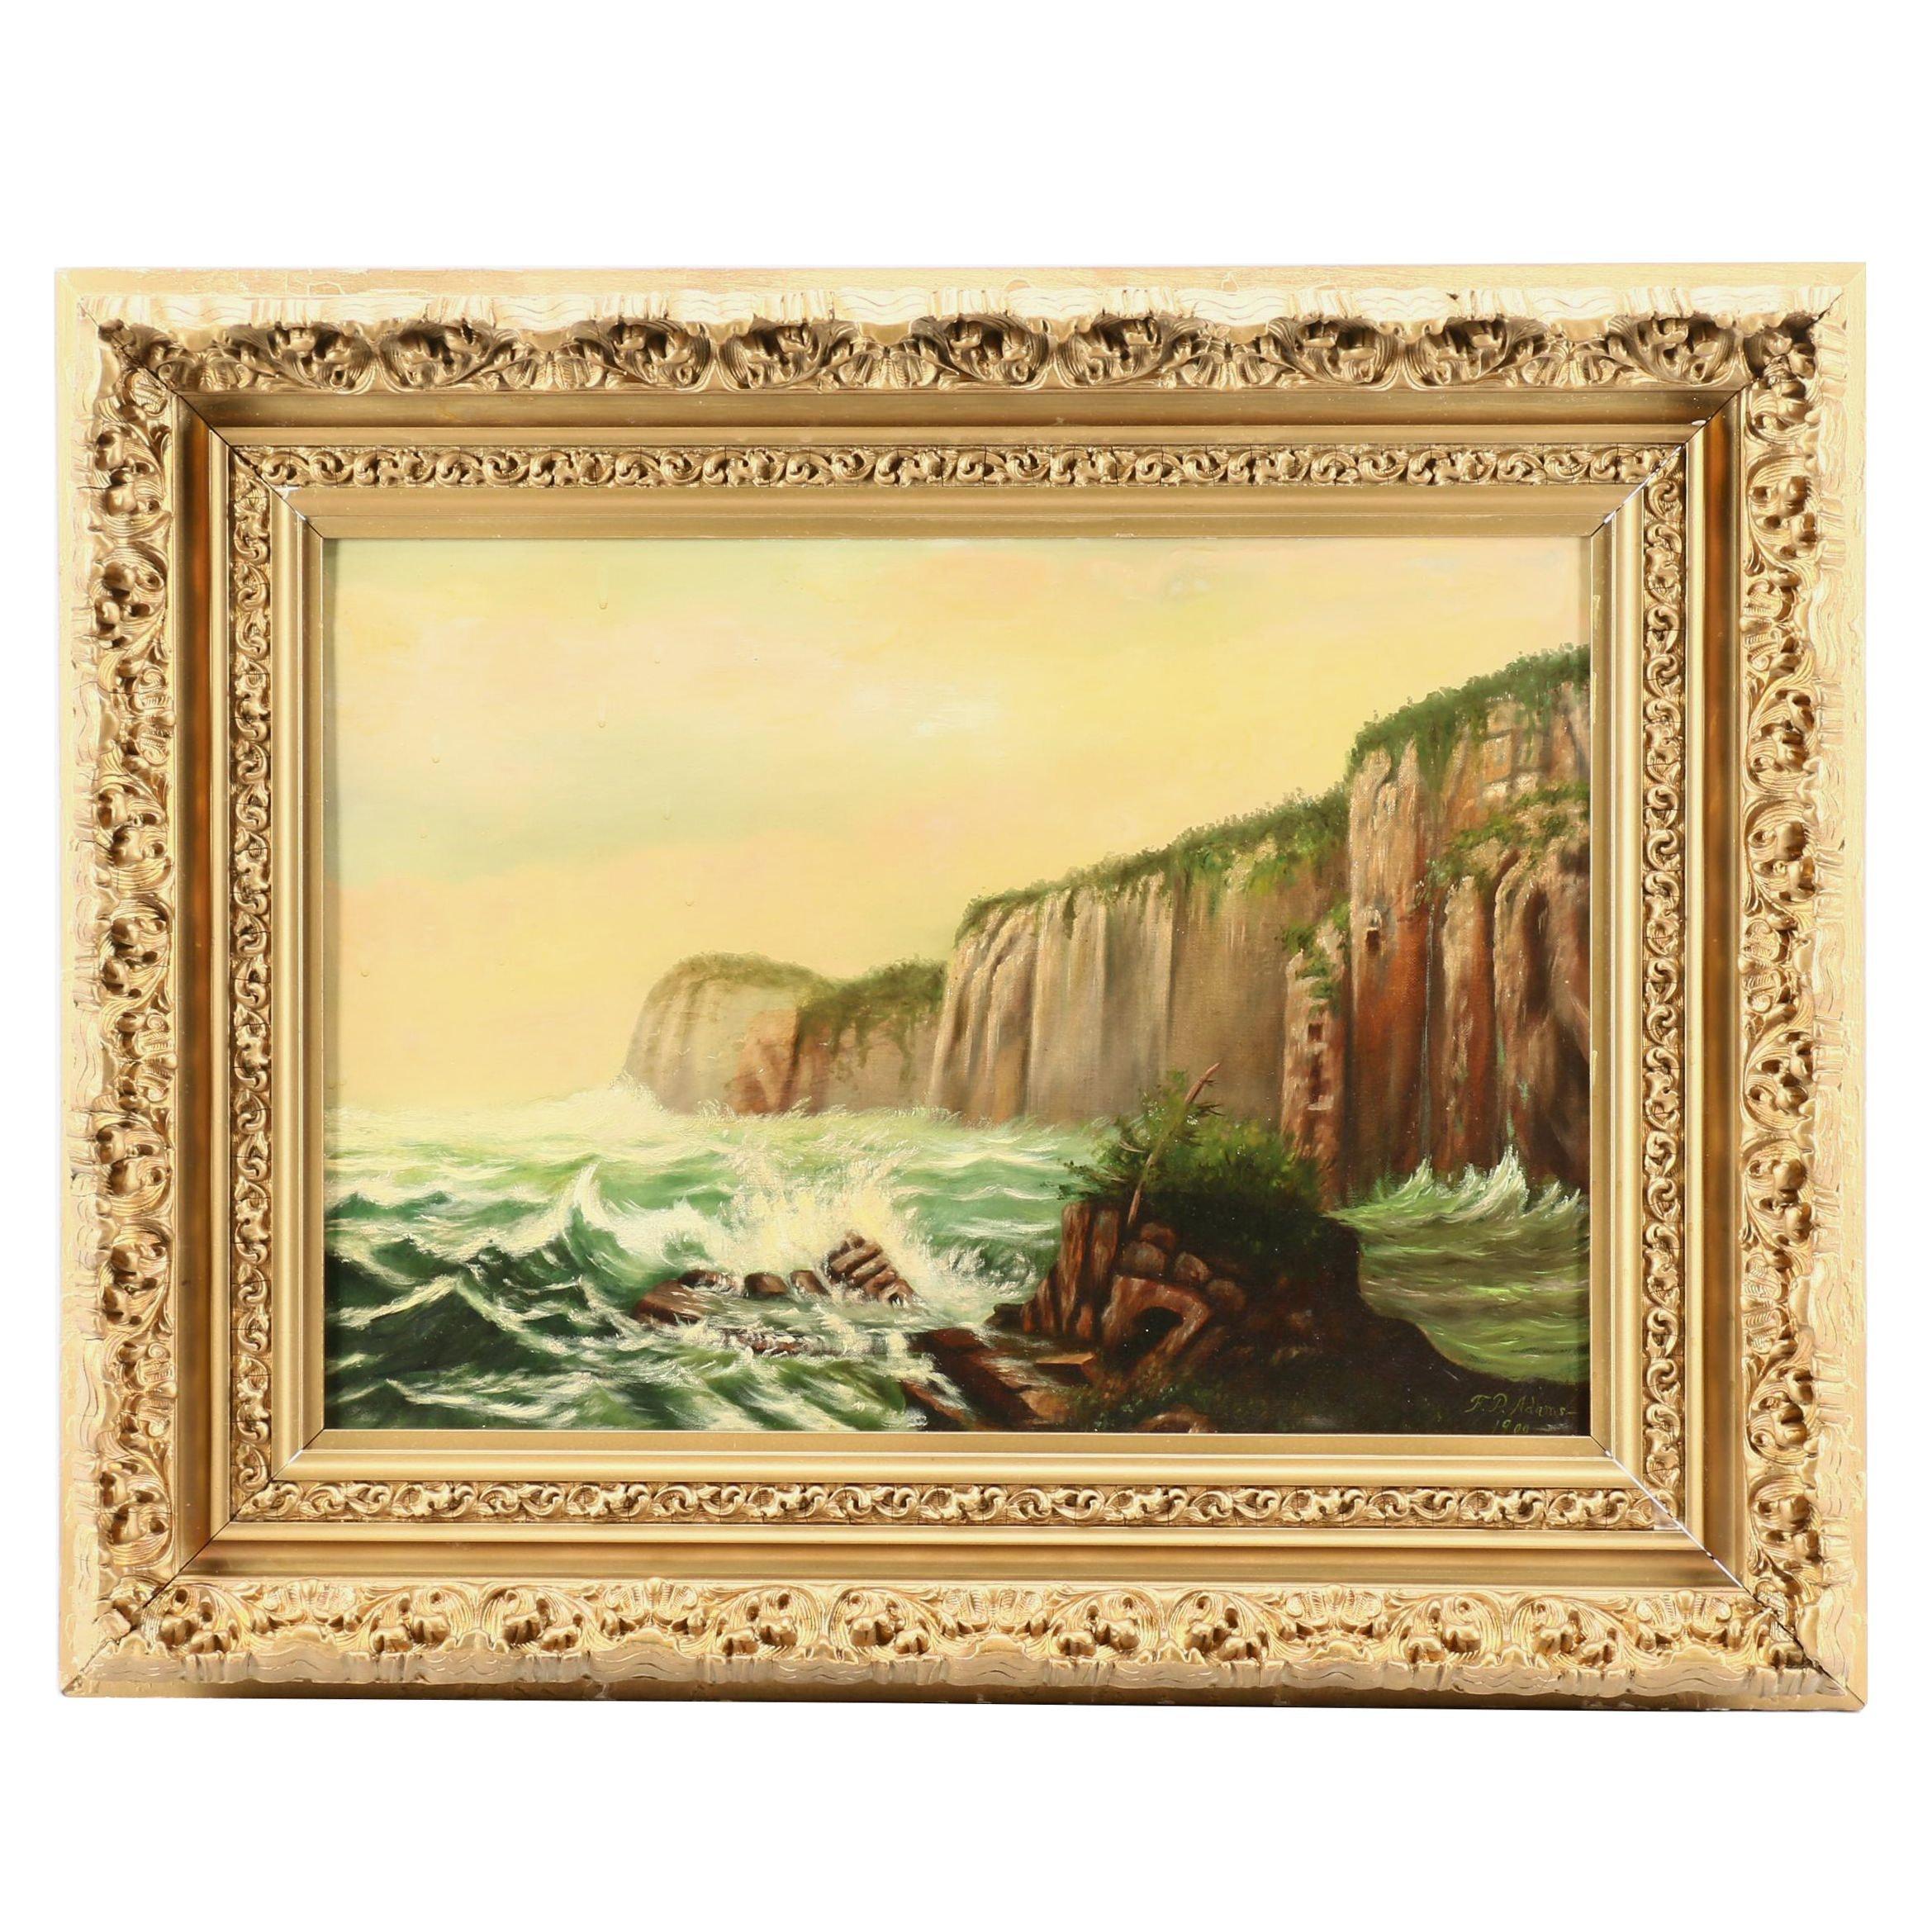 F. P. Adams Oil Painting of Coastal Cliffs